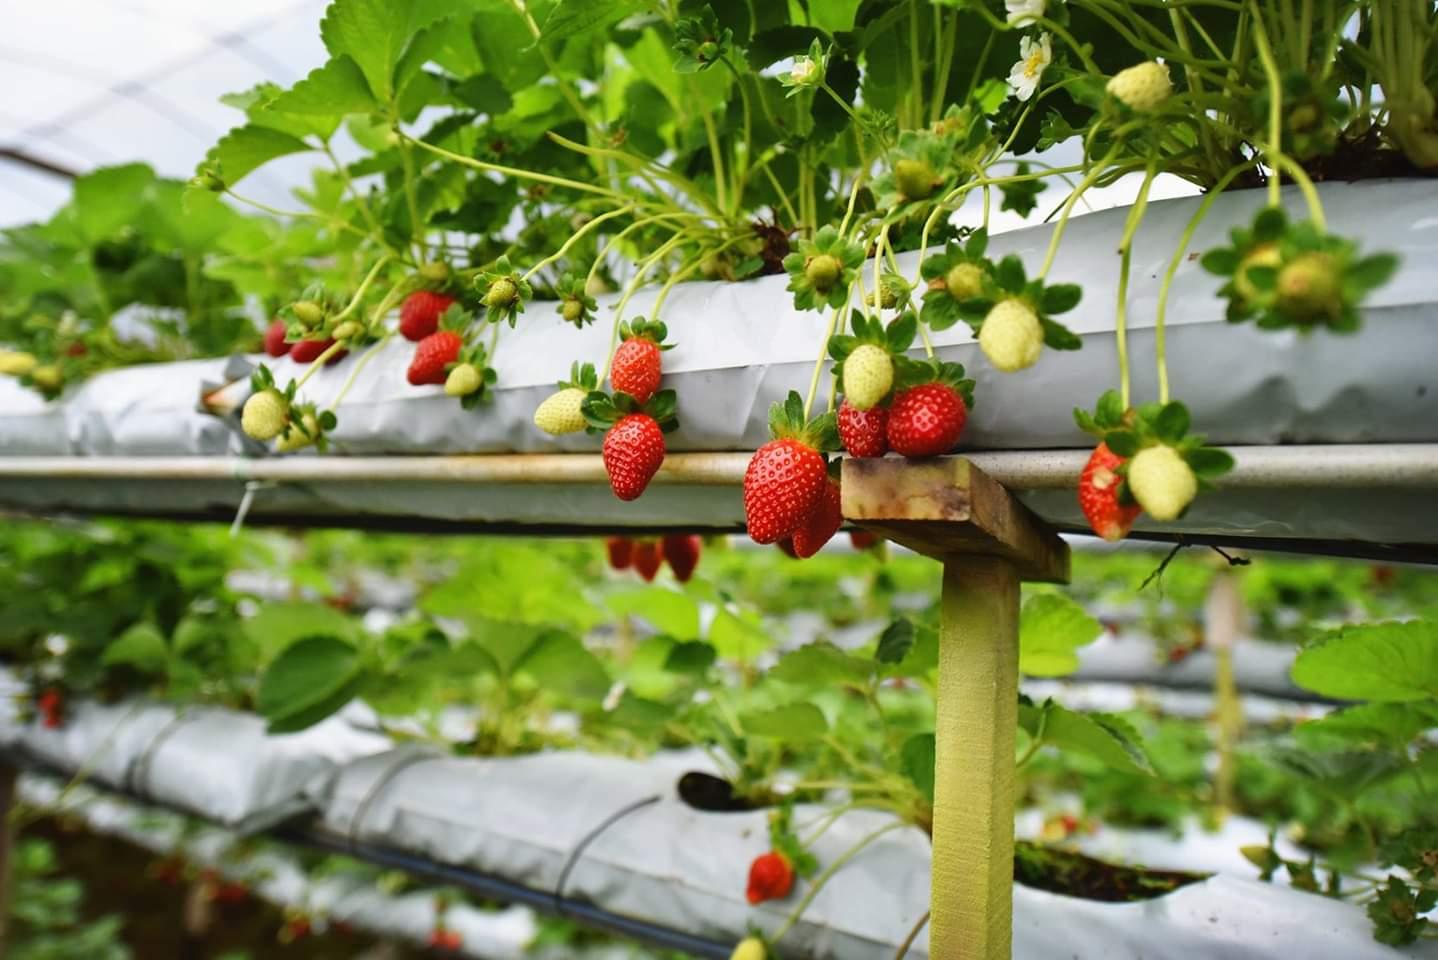 Genting Strawberry Leisure Farm